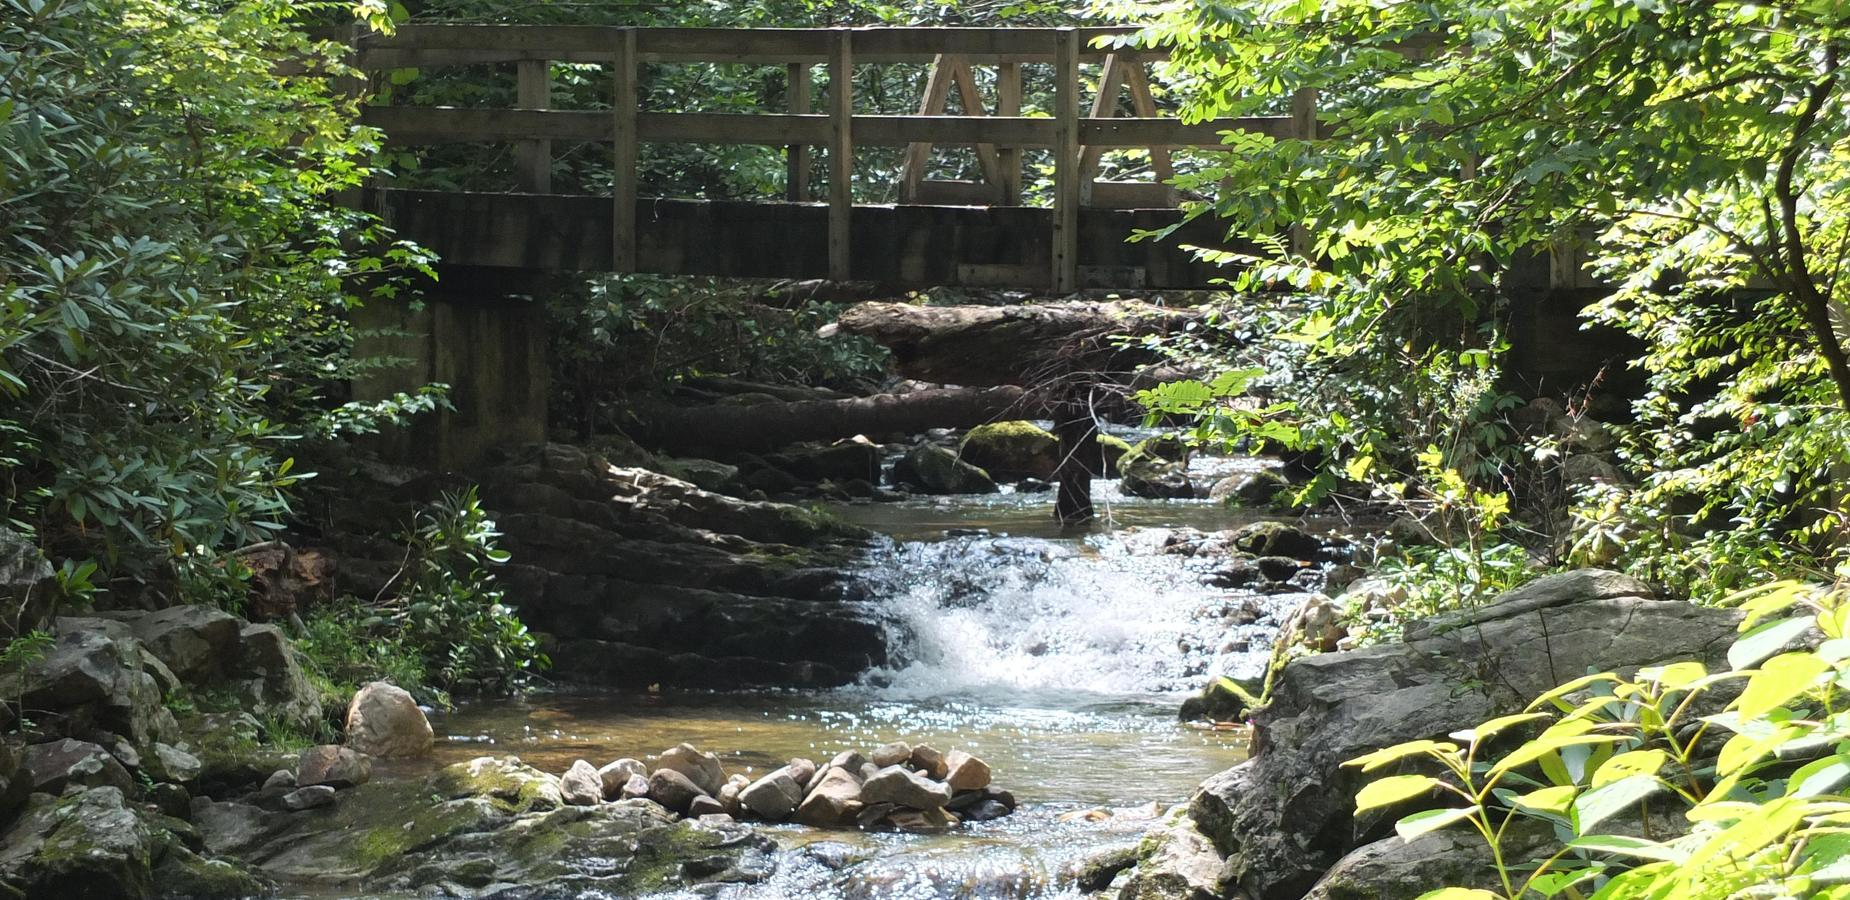 Horse Creek Park